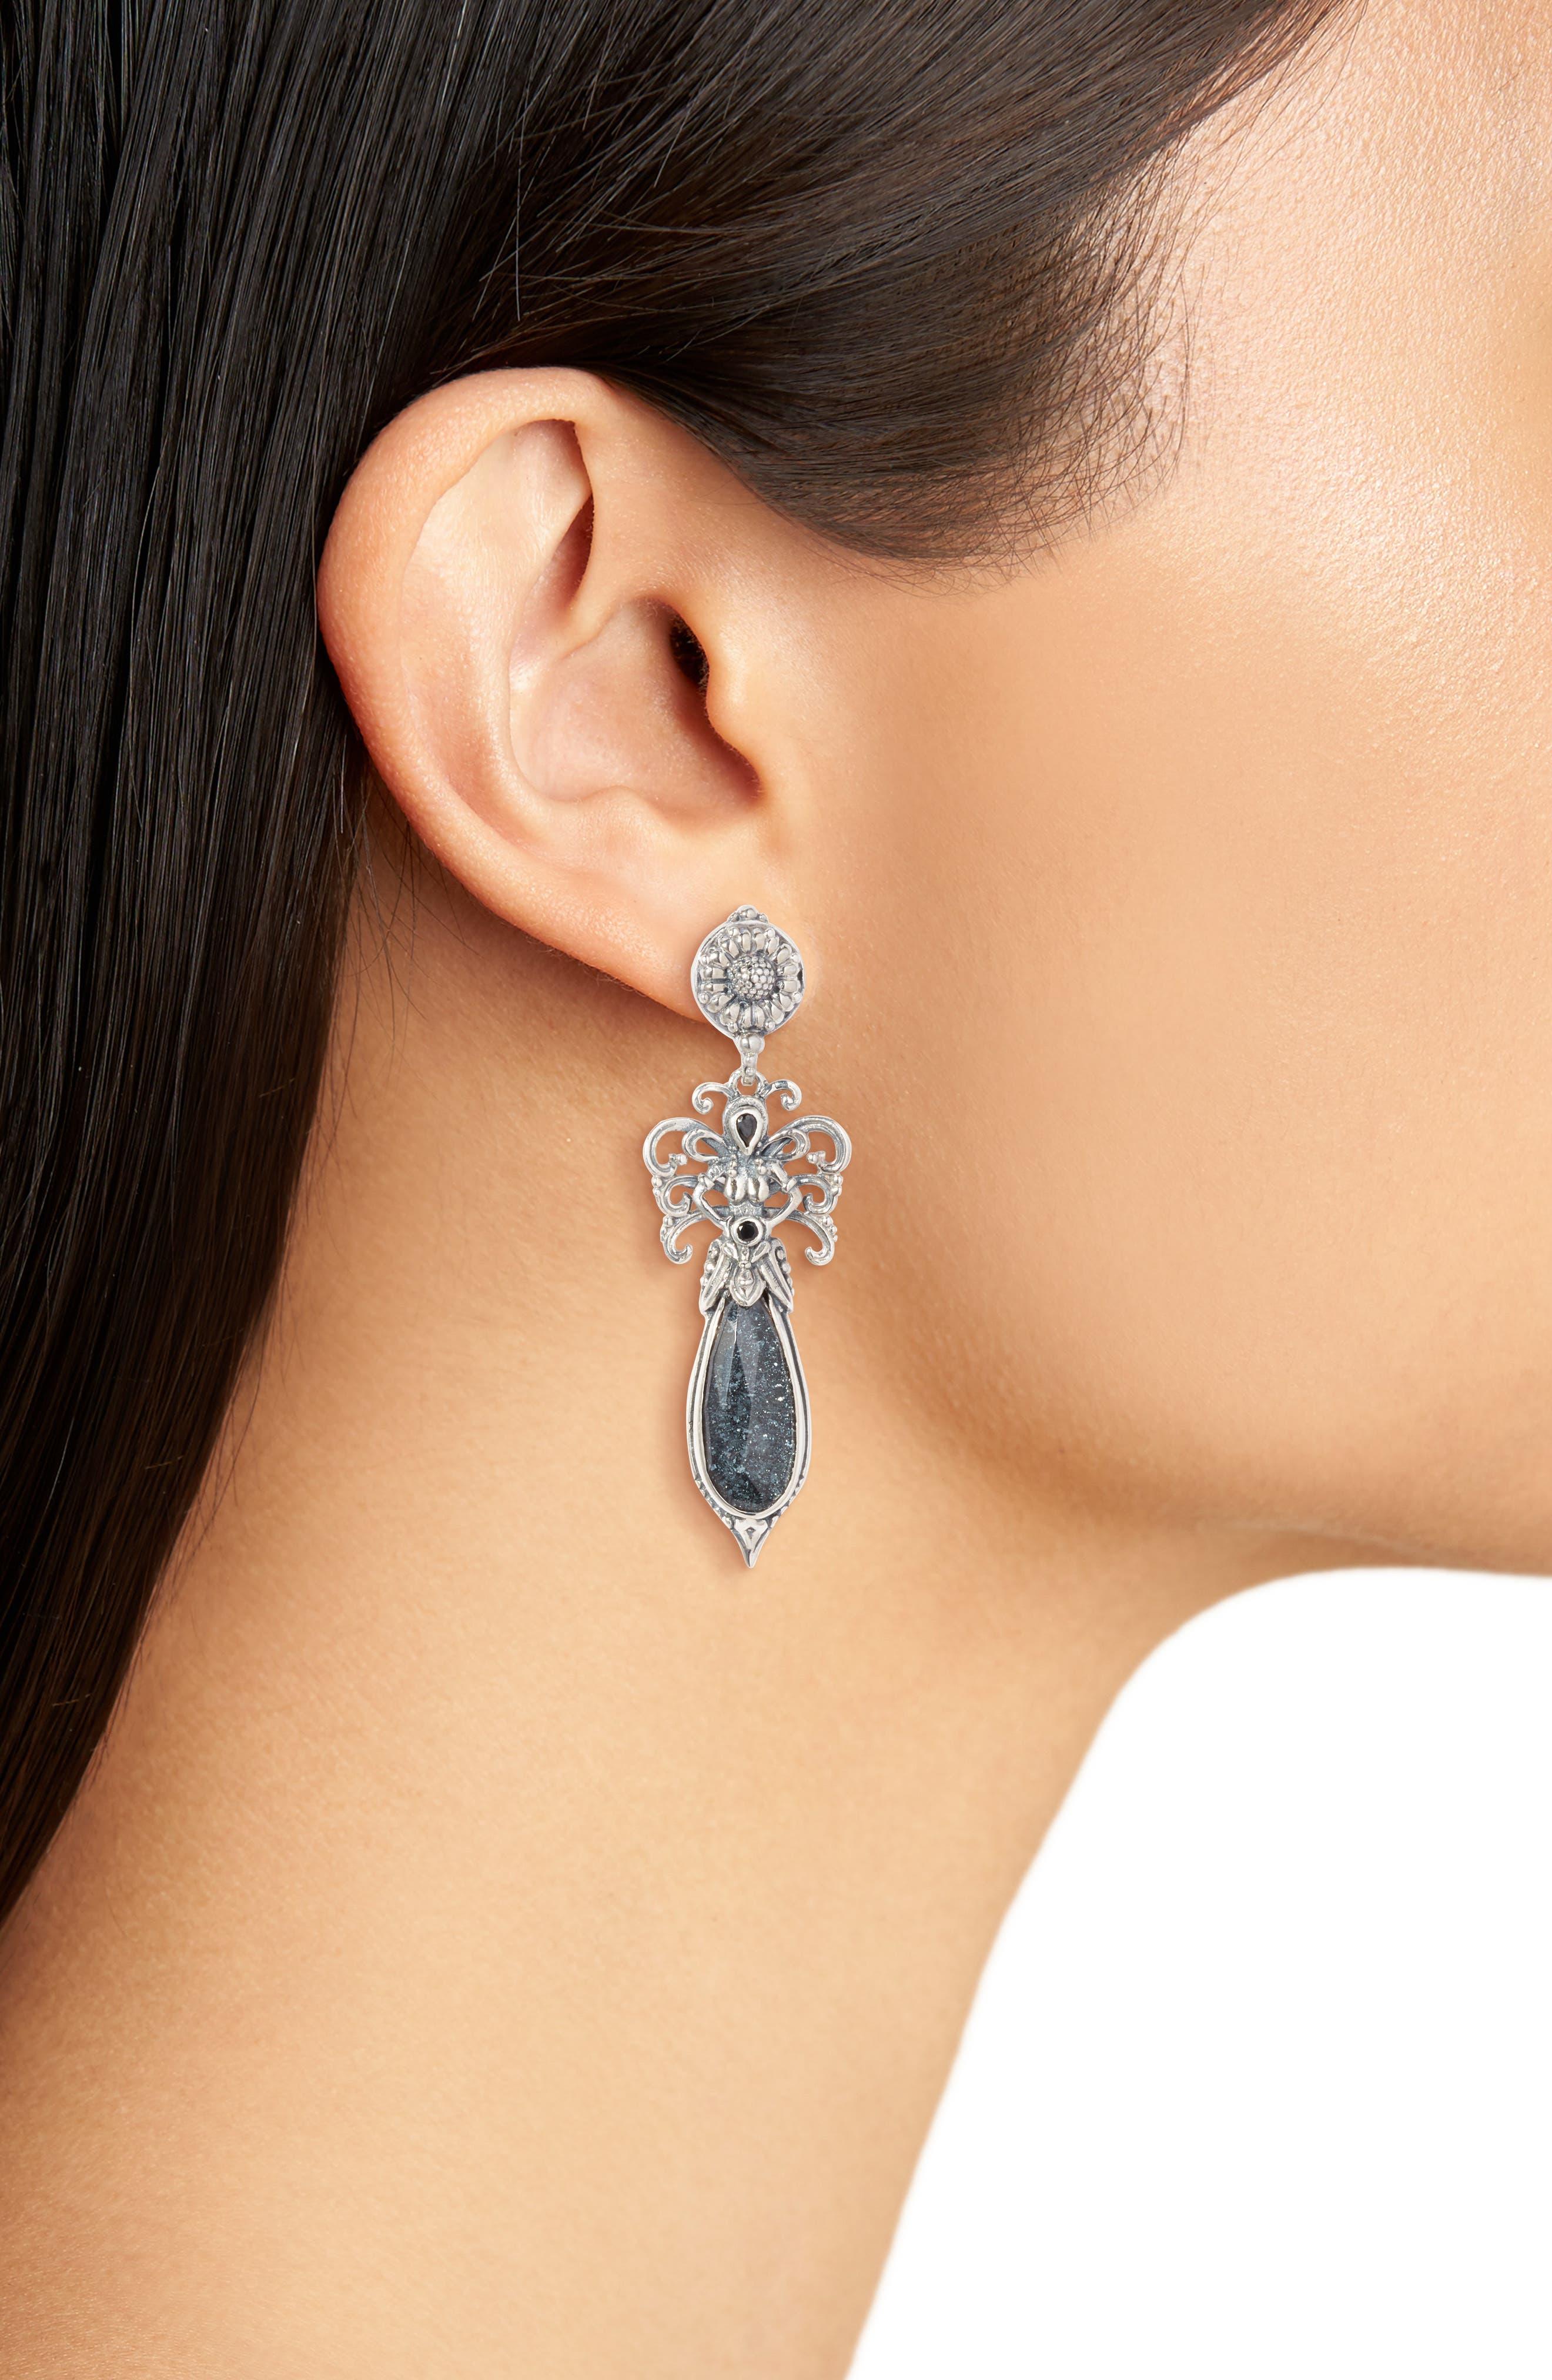 Santorini Spinel Drop Earrings,                             Alternate thumbnail 2, color,                             SILVER/ HEMATITE